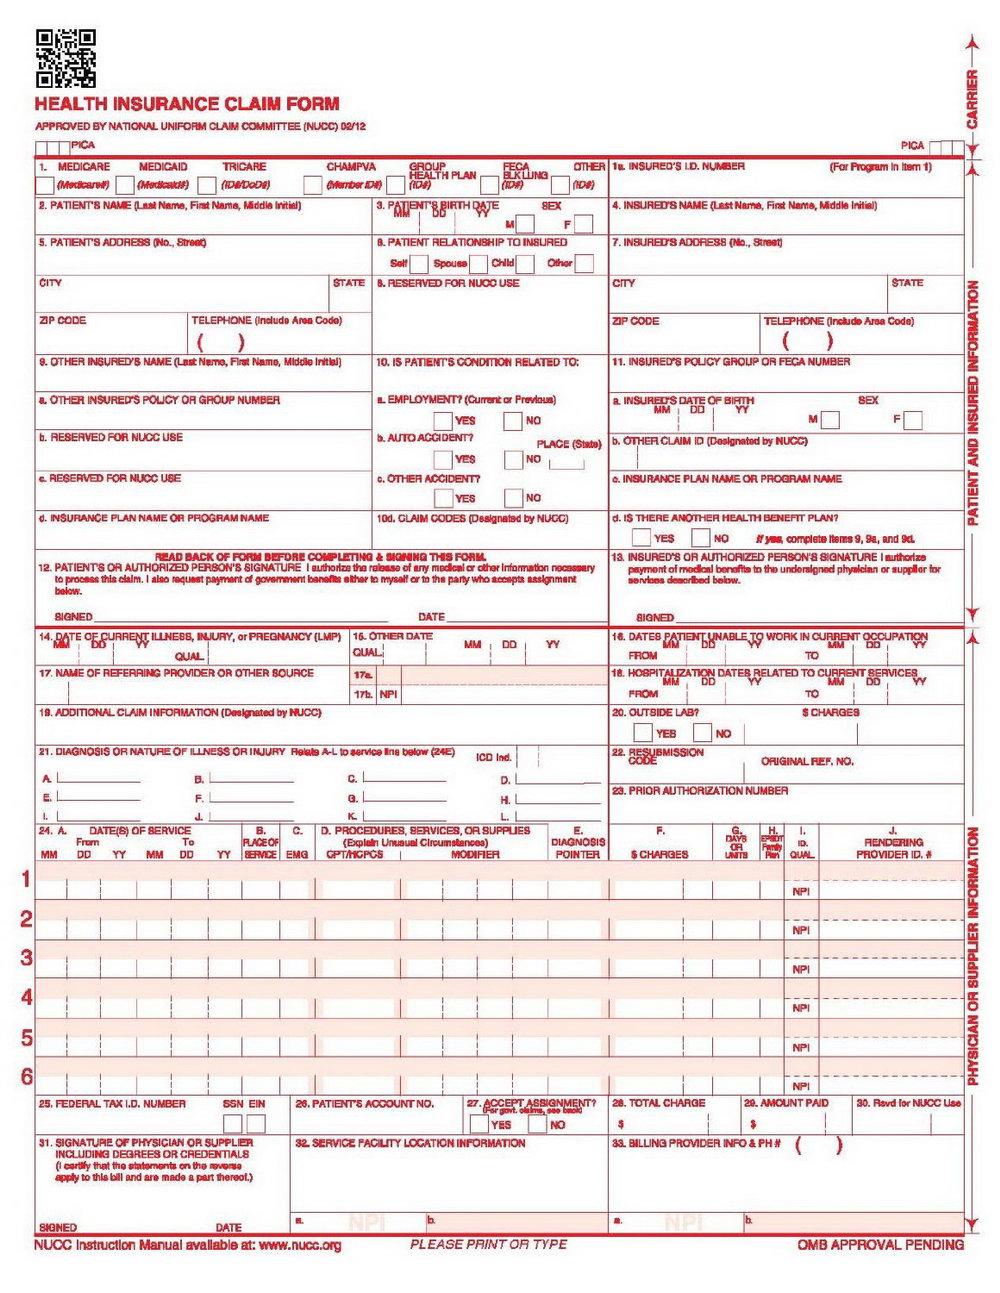 Printable Cms 1500 Forms